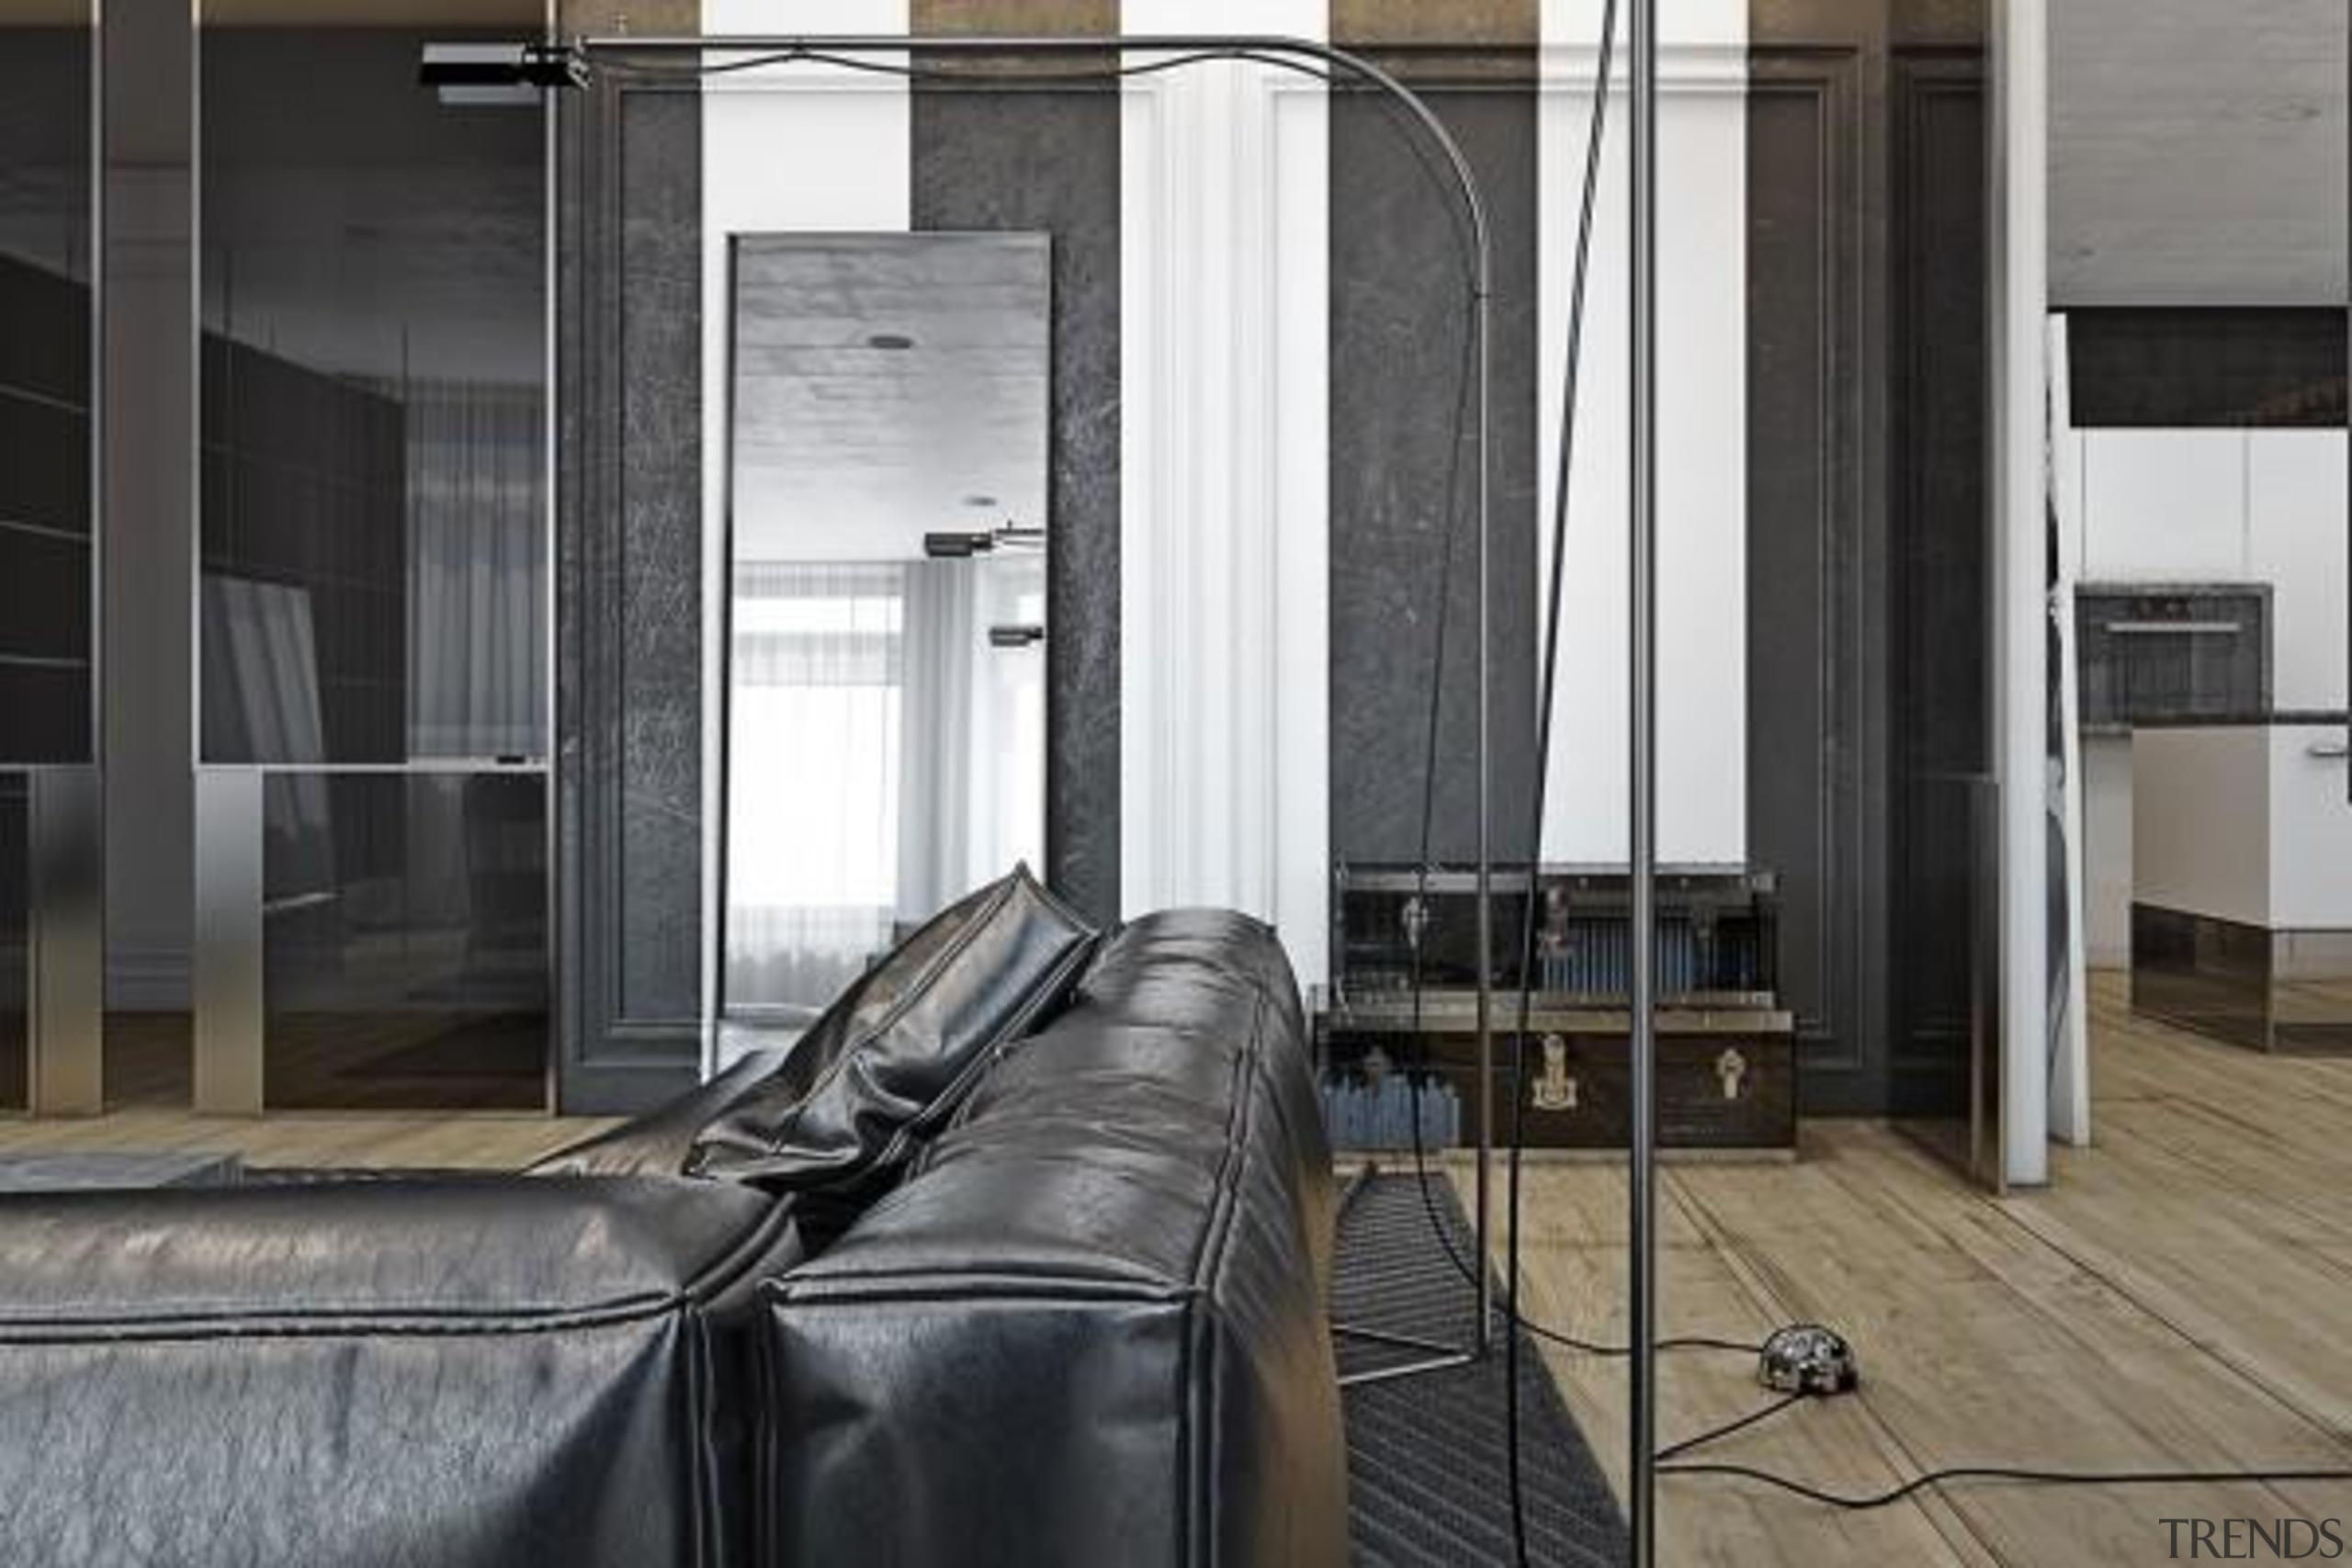 soft leather sofa - Masculine Apartments - architecture architecture, building, door, floor, flooring, furniture, glass, interior design, window, black, gray